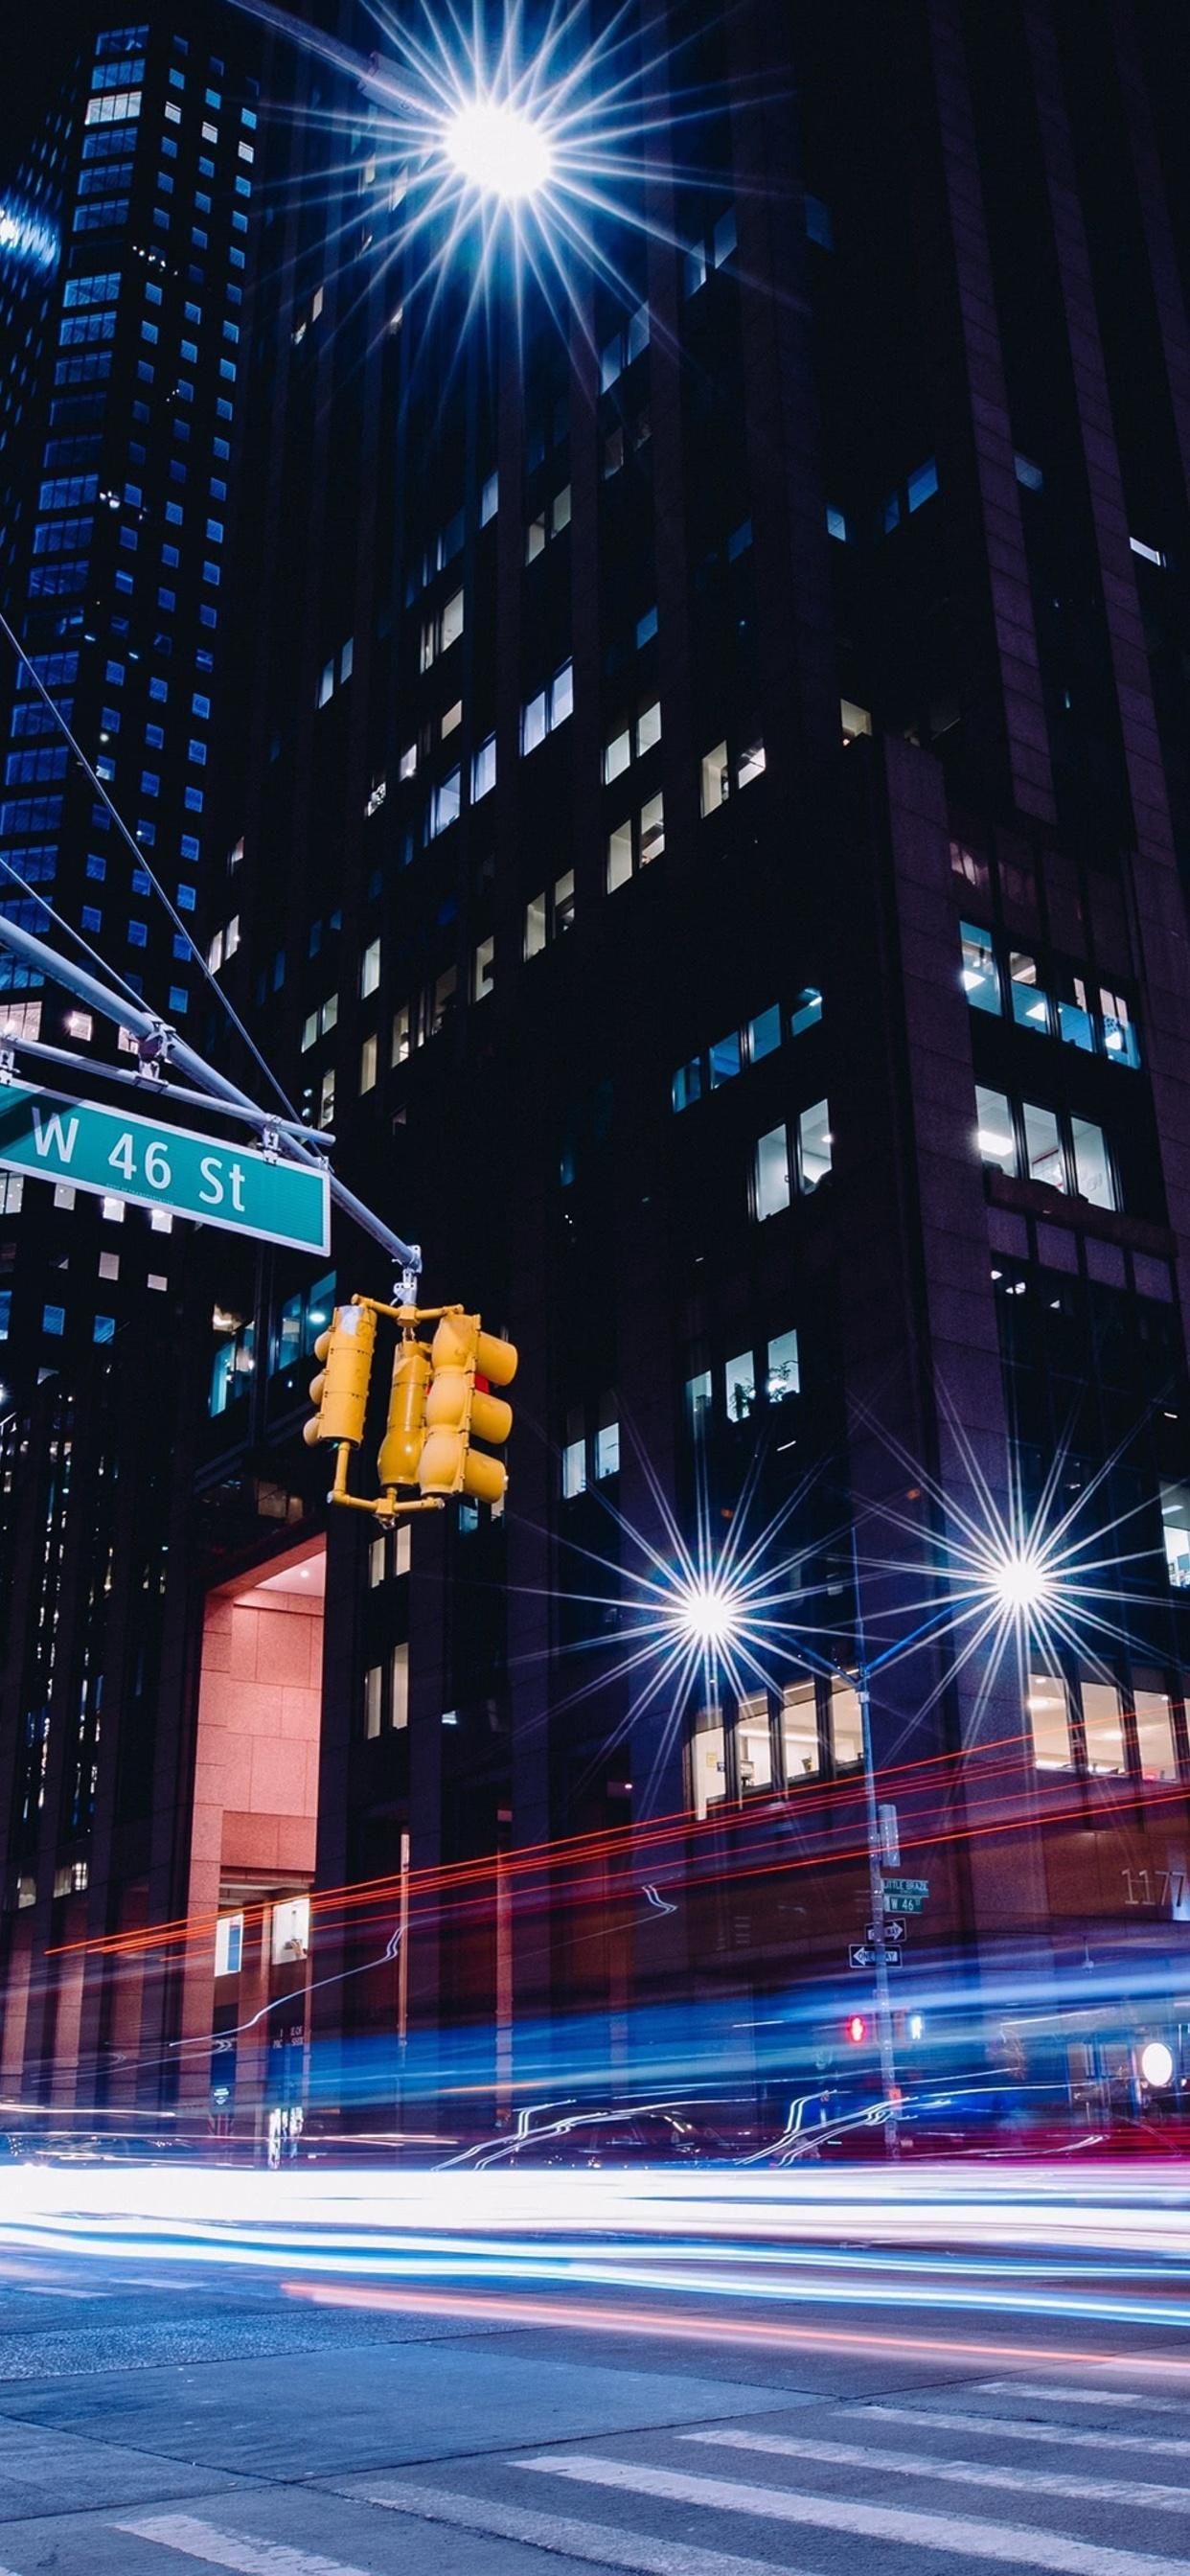 city-urban-modern-night-architecture-long-exposure-4k-ah.jpg